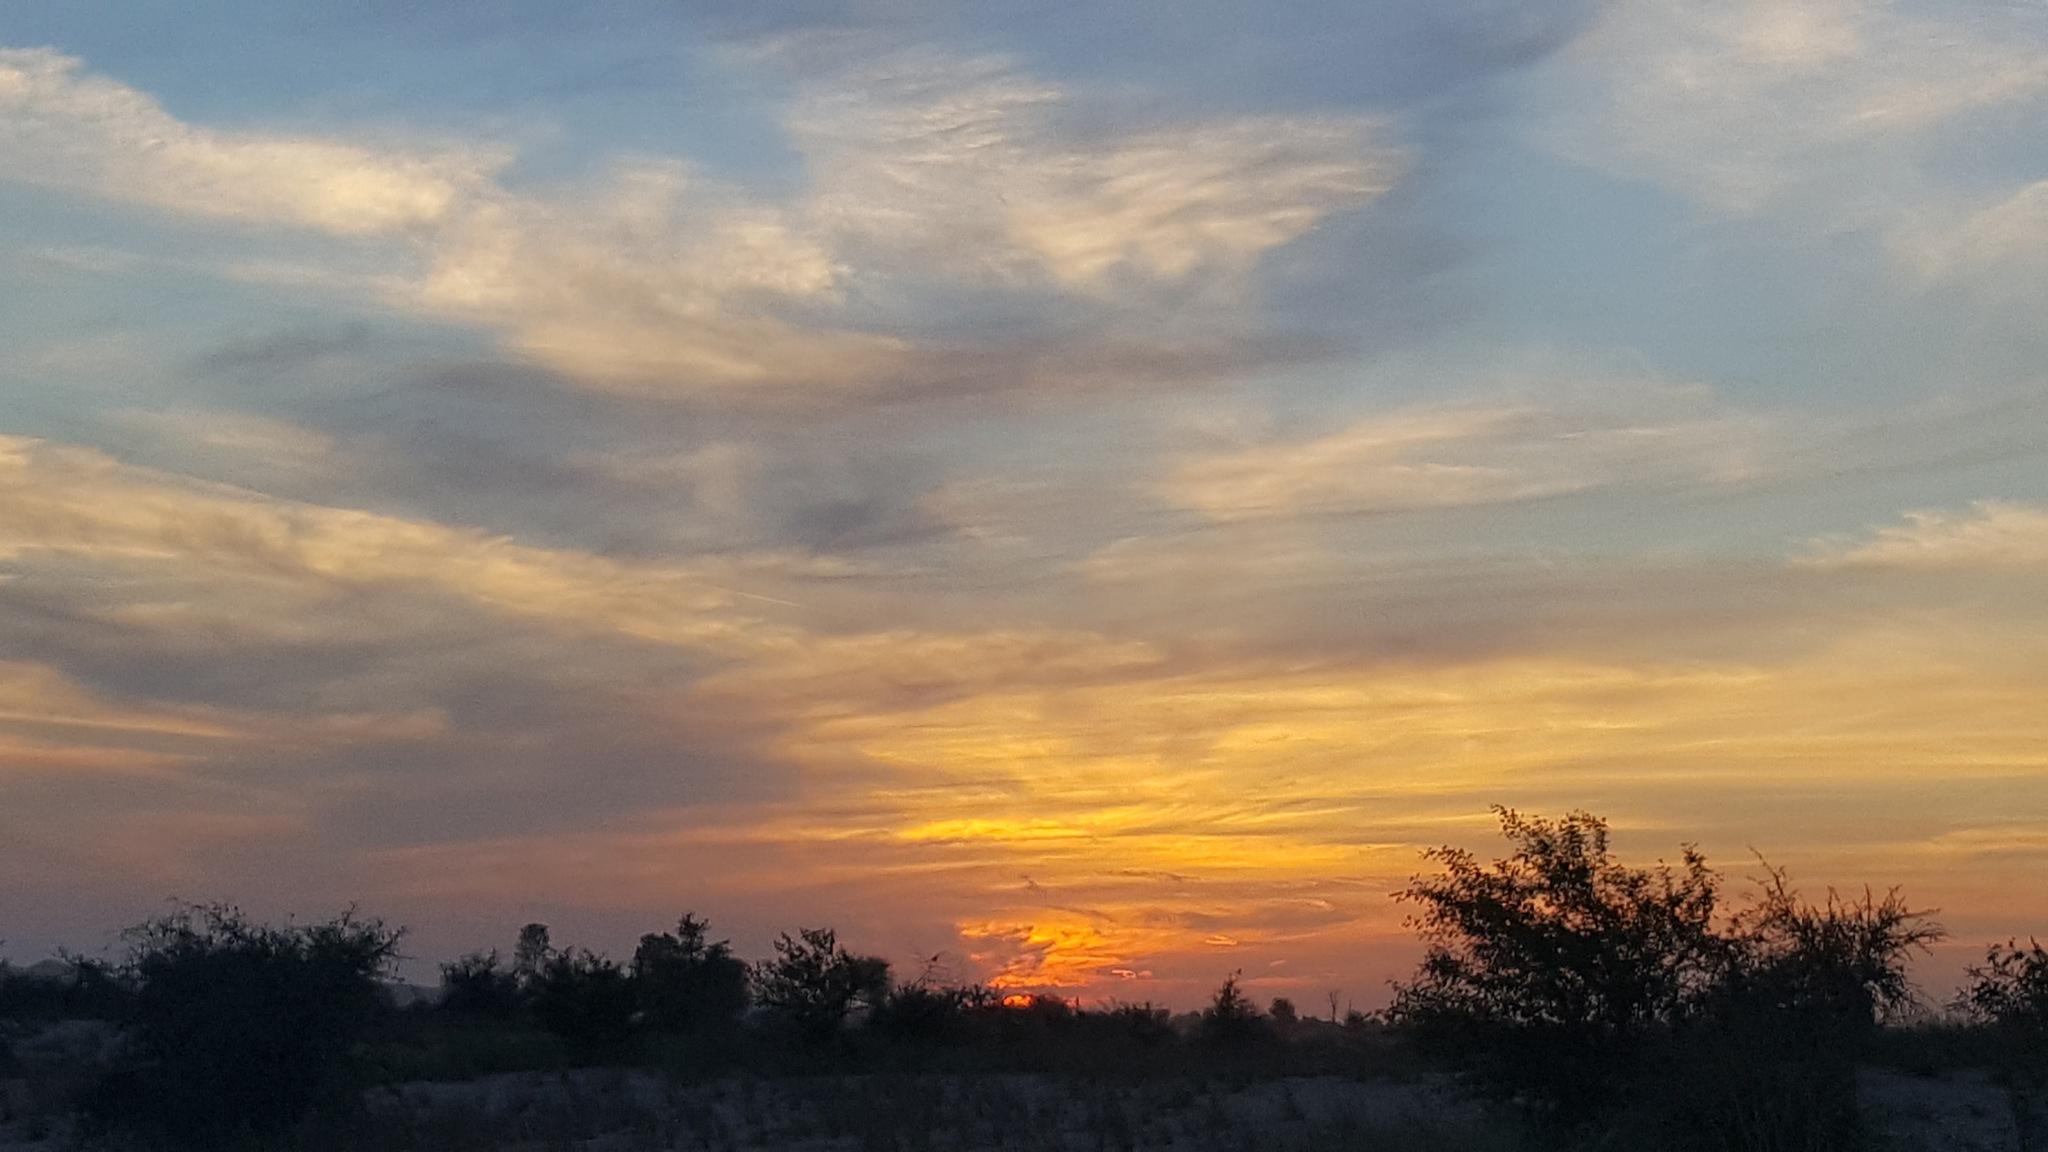 Sunset at Al qudra lakes taken with Samsung Galaxy S6 edge plus  by shyambhagra